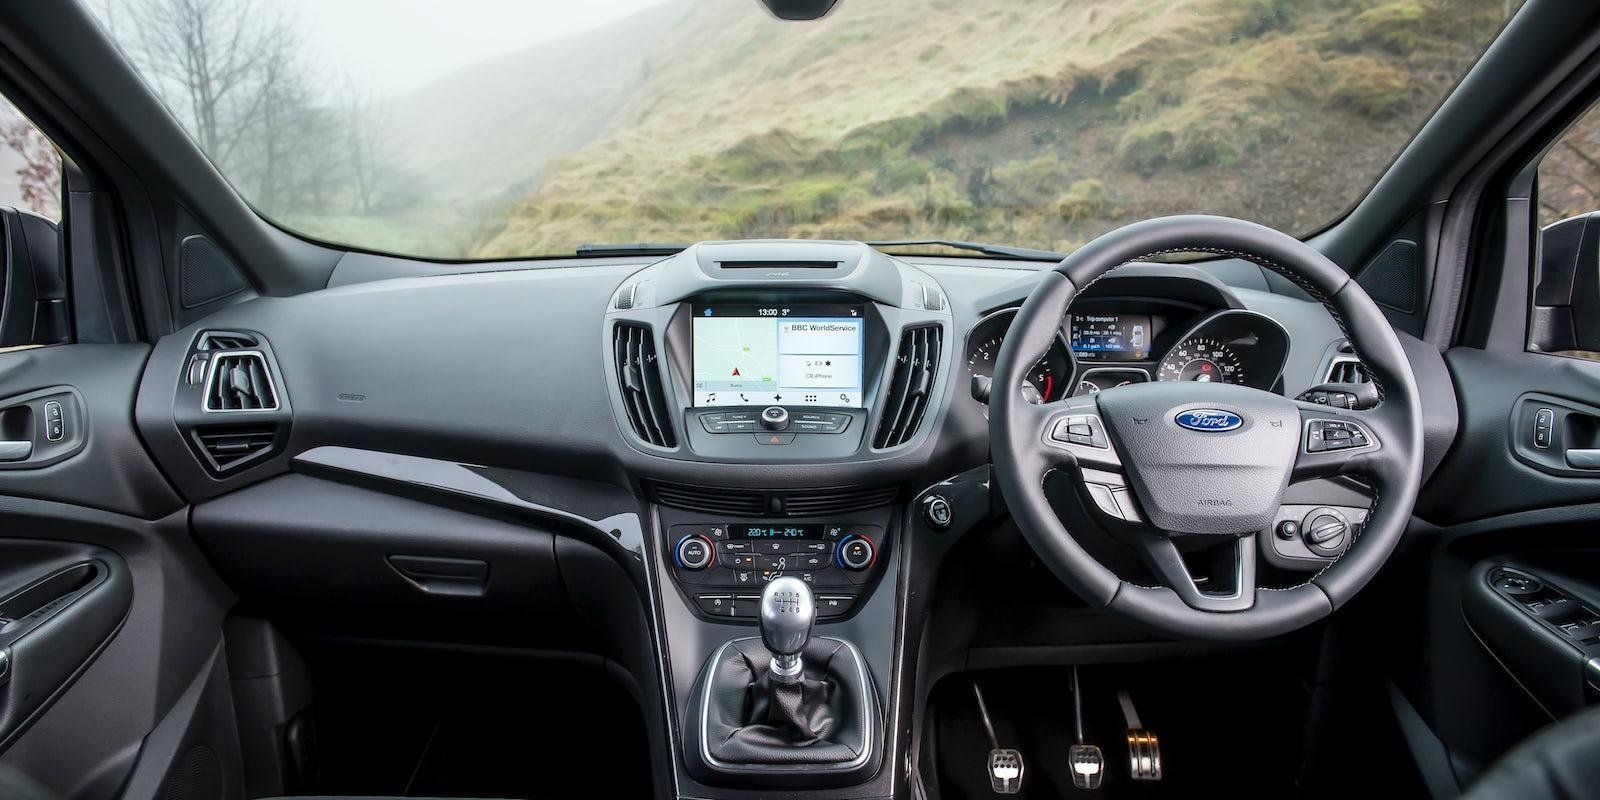 Ford Kuga Interior & Infotainment | carwow